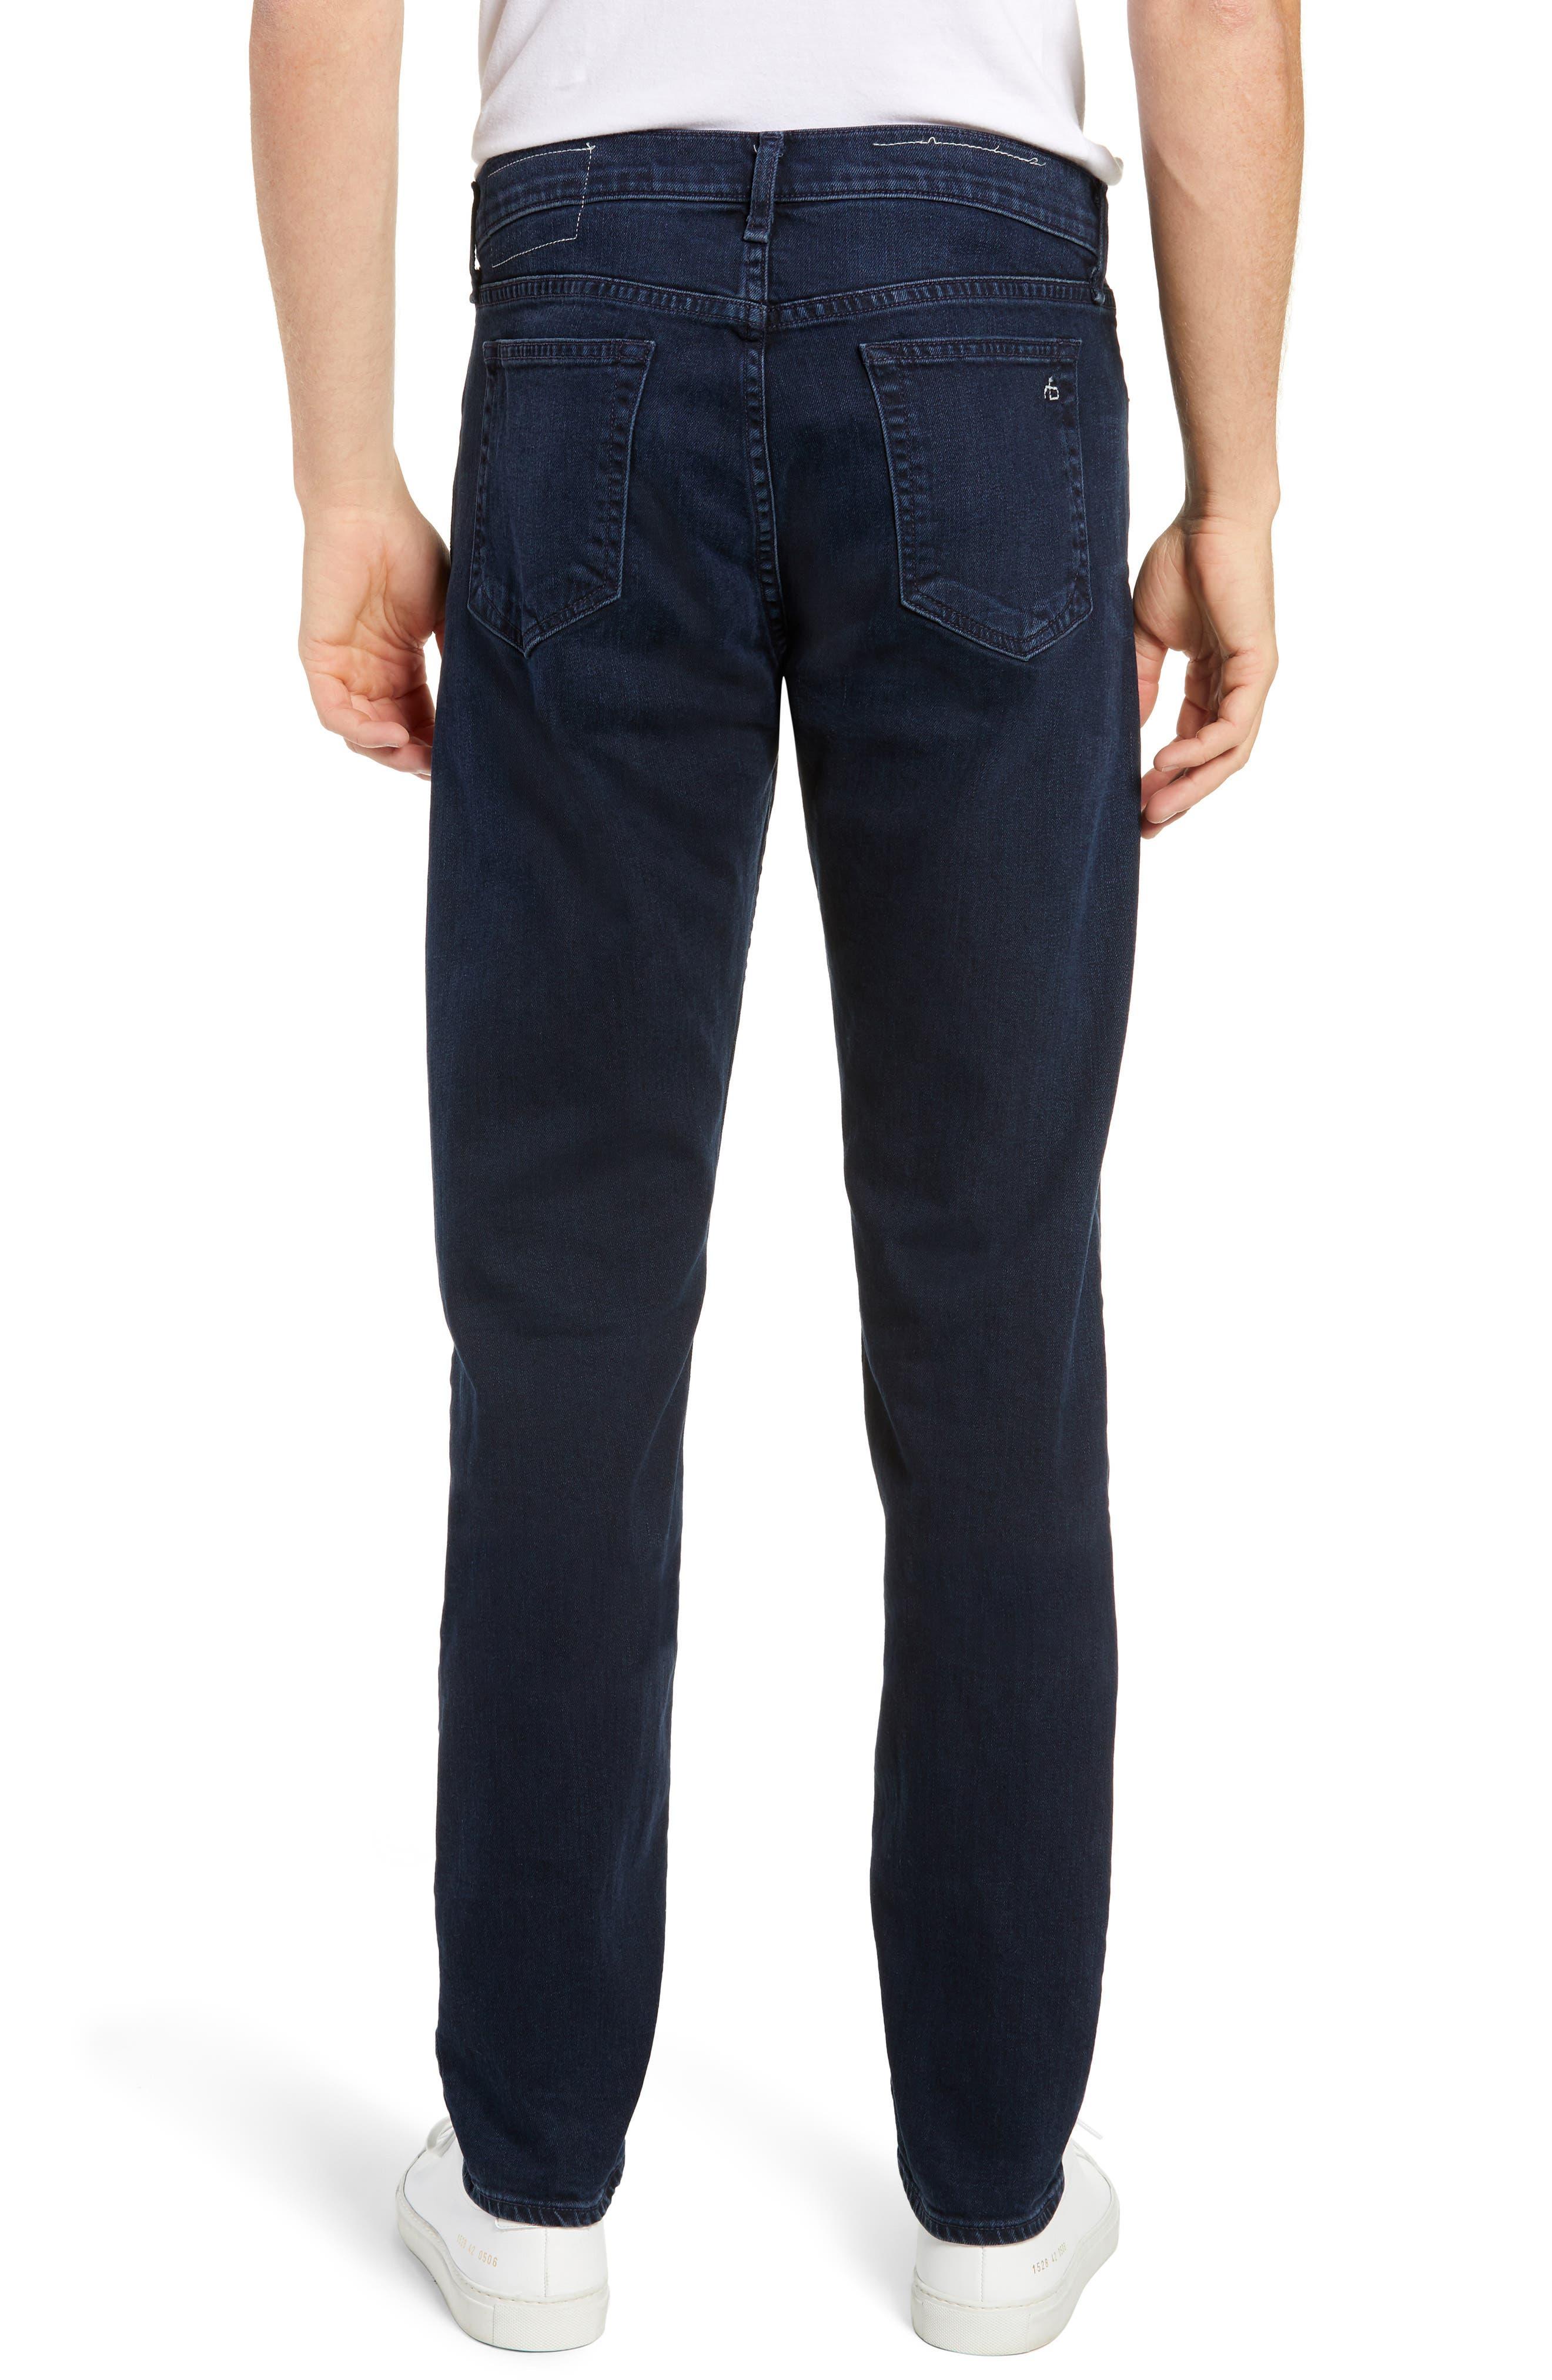 Fit 3 Slim Straight Leg Jeans,                             Alternate thumbnail 2, color,                             BAYVIEW